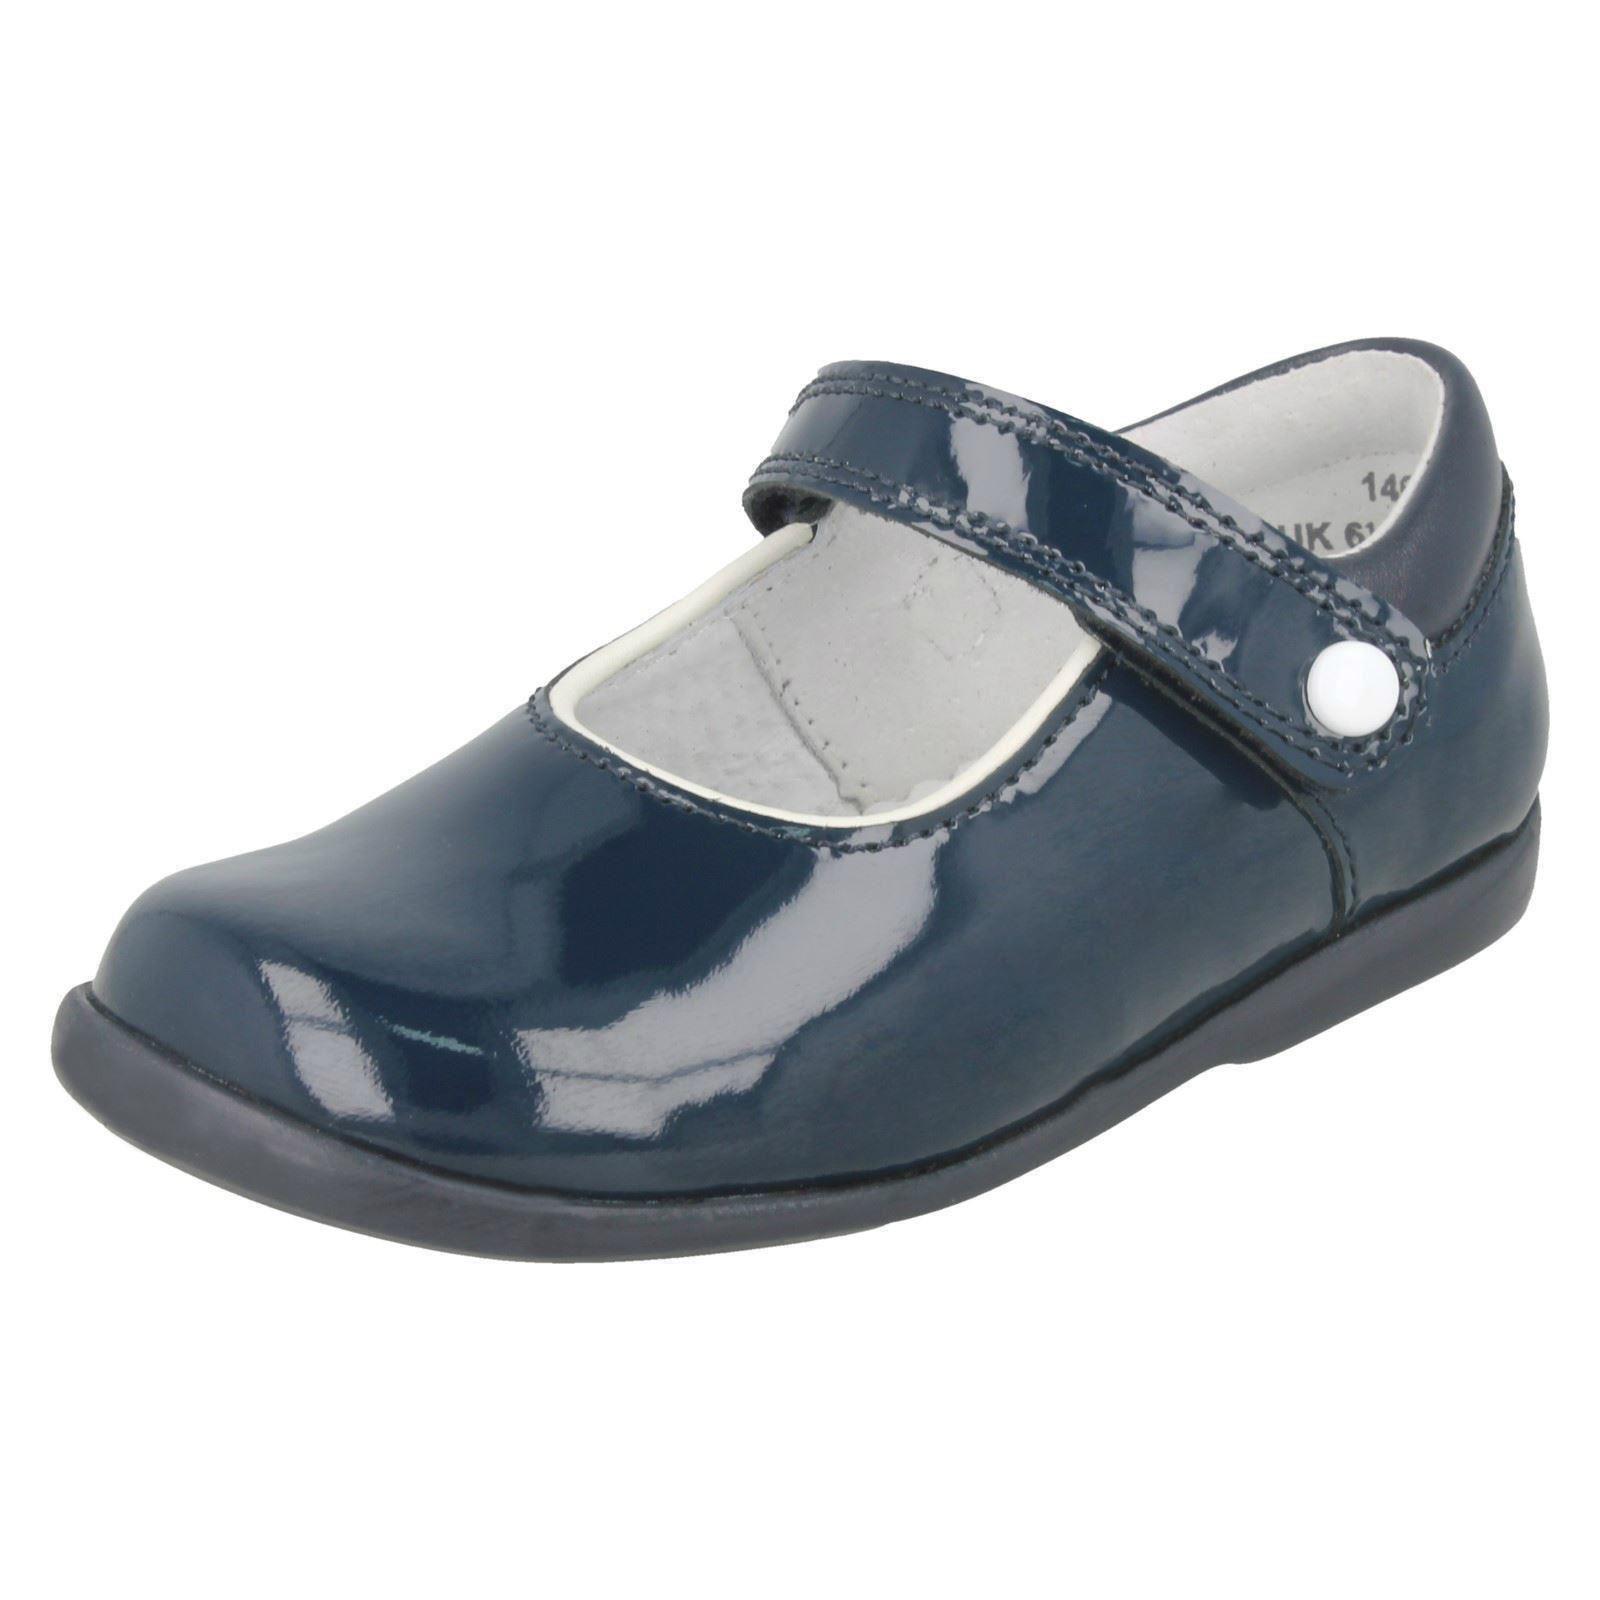 Infantil Niñas Startrite Zapatos Planos Nancy